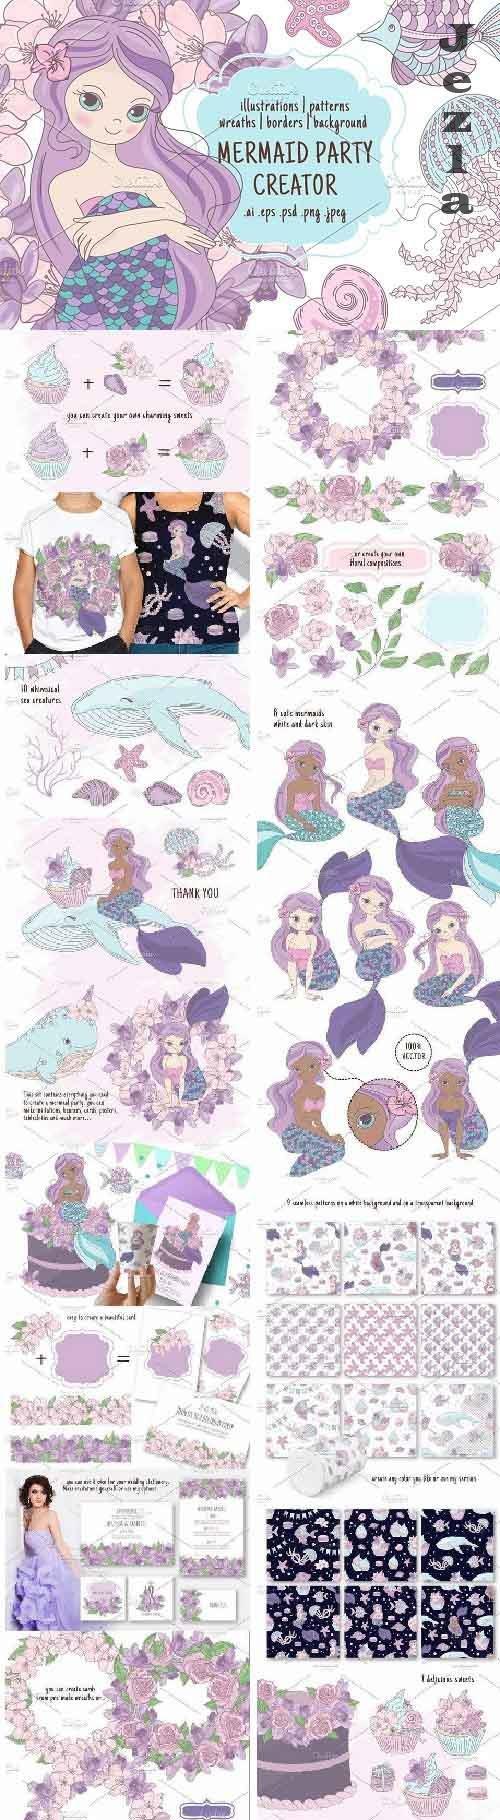 Mermaid Party Creator - 5005467